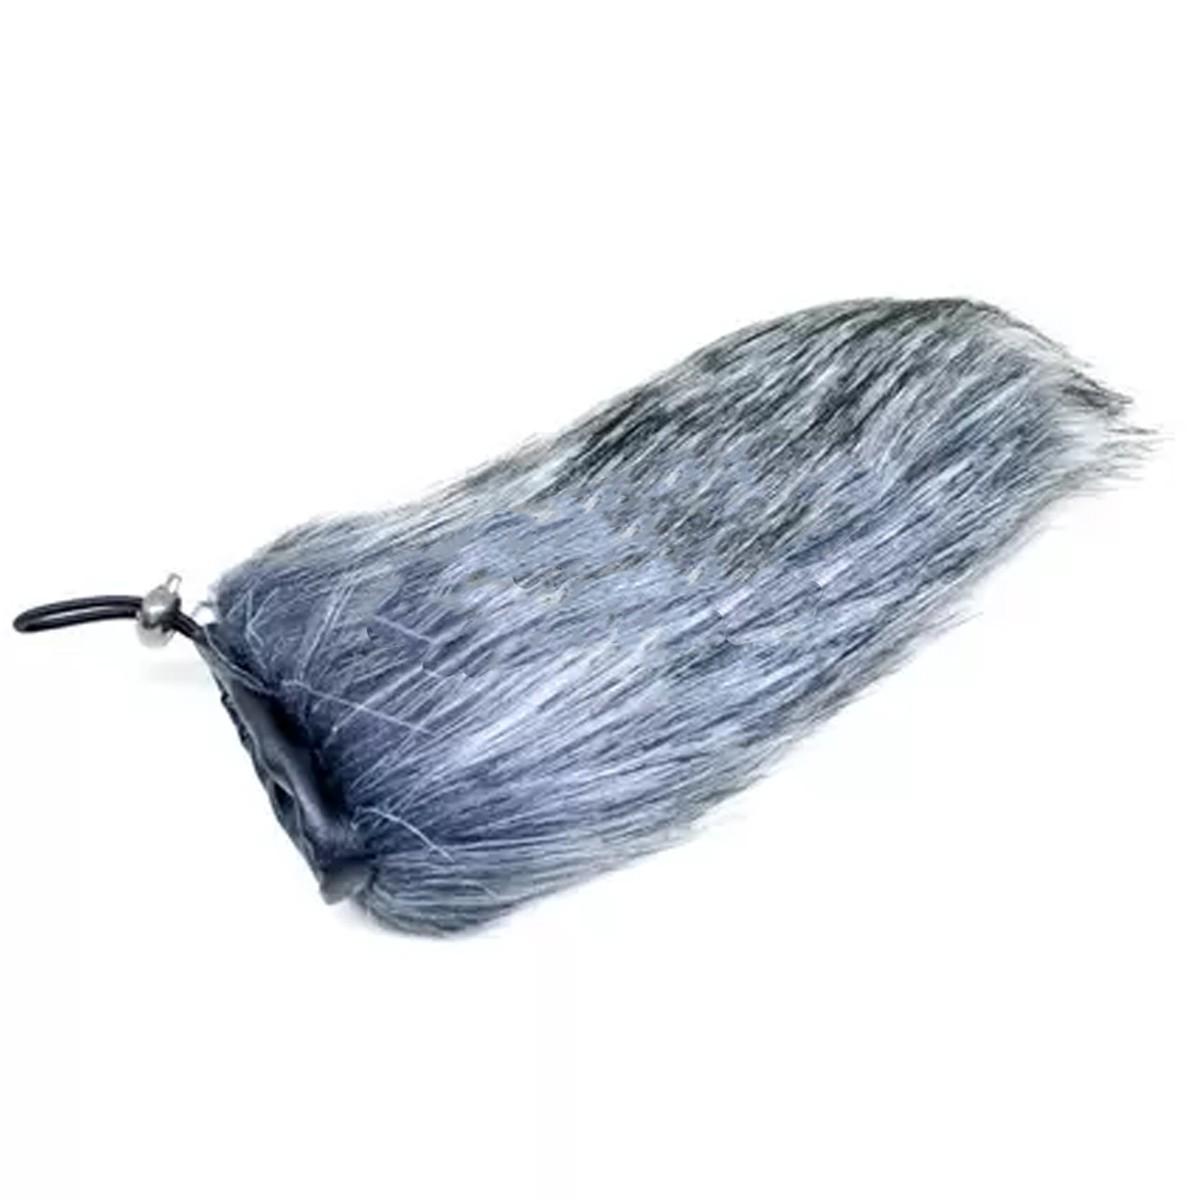 Protetor de vento deadcat para microfone de 18x5cm CSR2016M